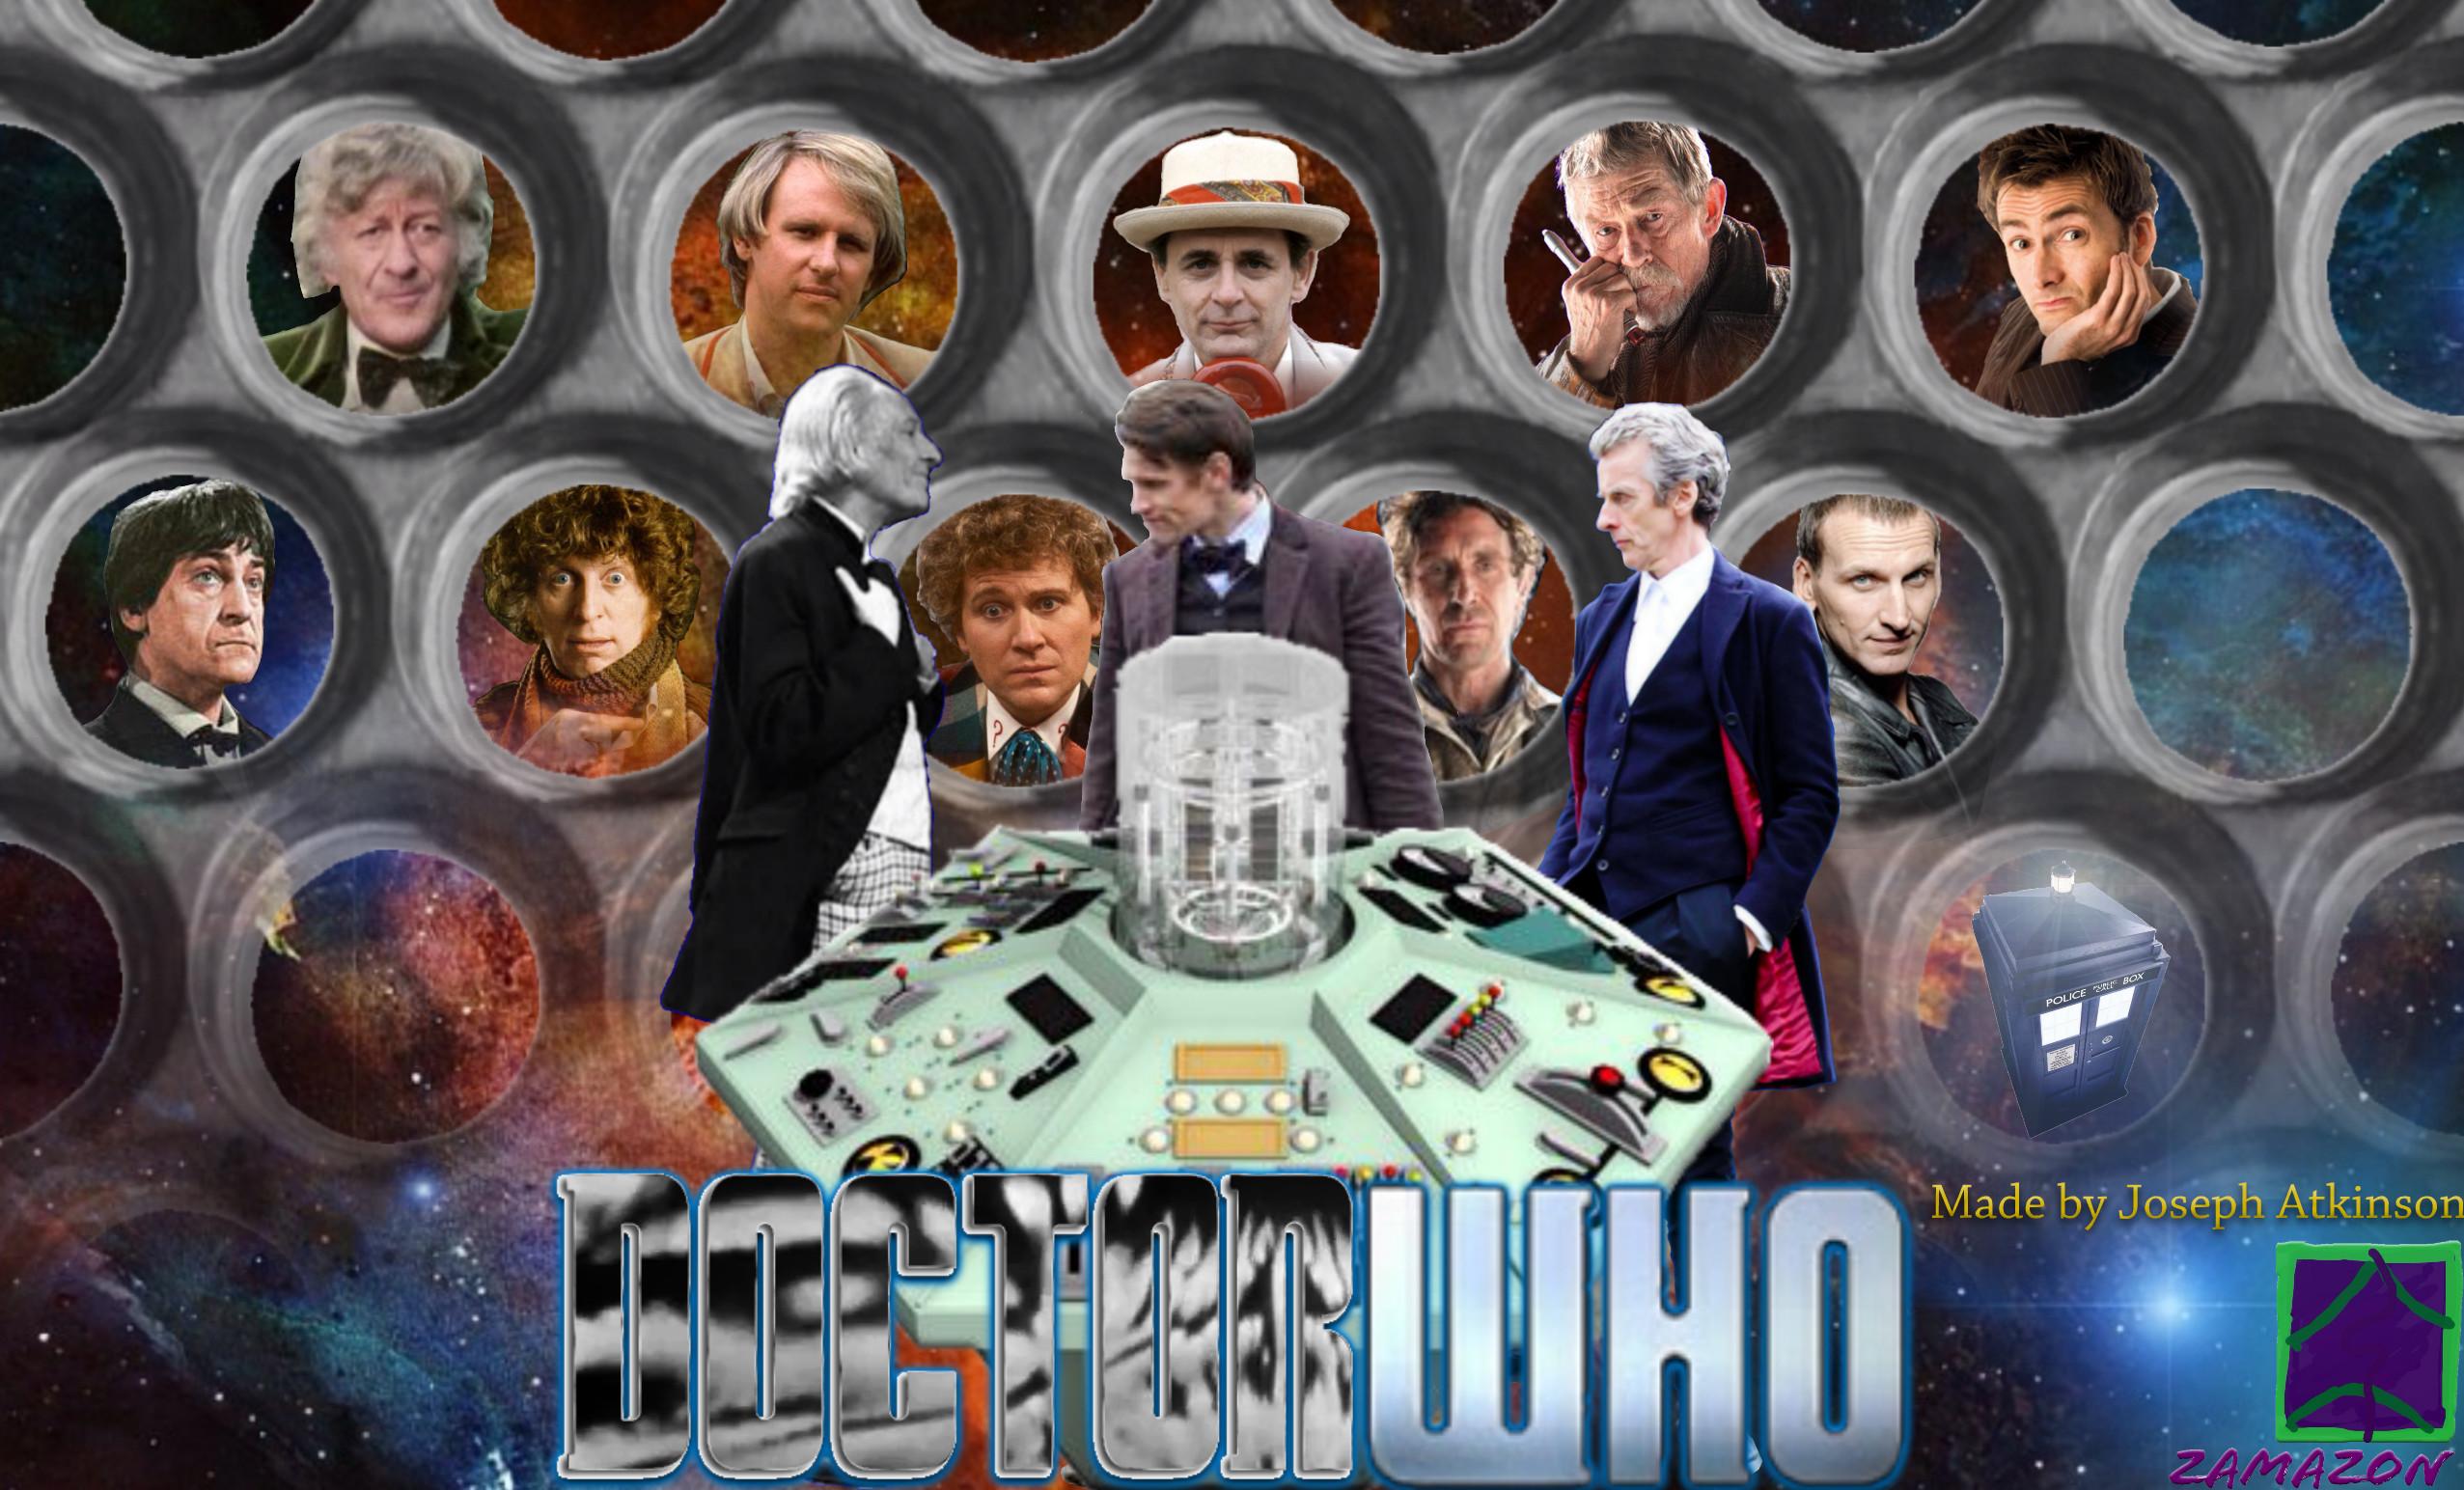 The 13 doctors by vvjosephvv The 13 doctors by vvjosephvv